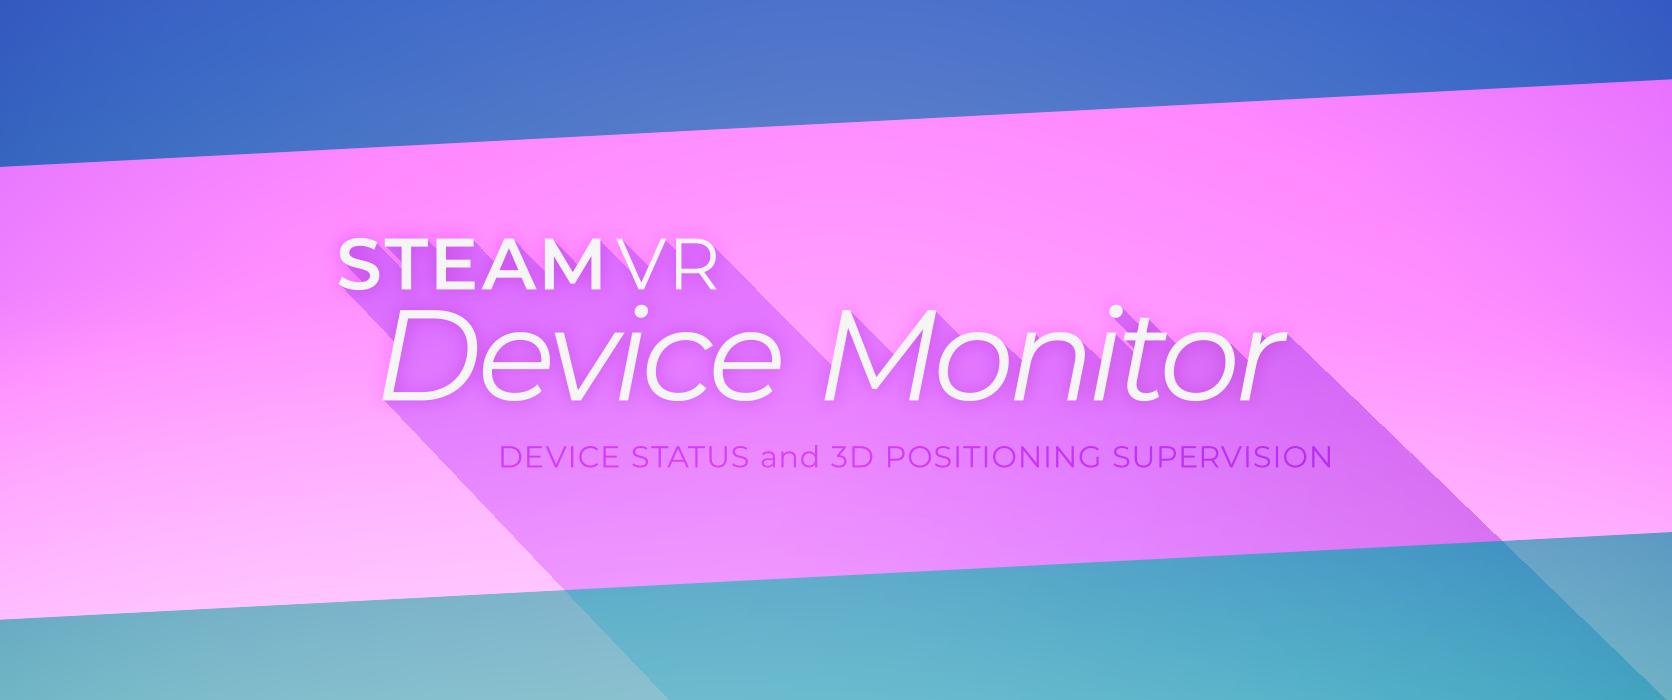 SteamVR・HTC Vive のトラッキング品質の改善